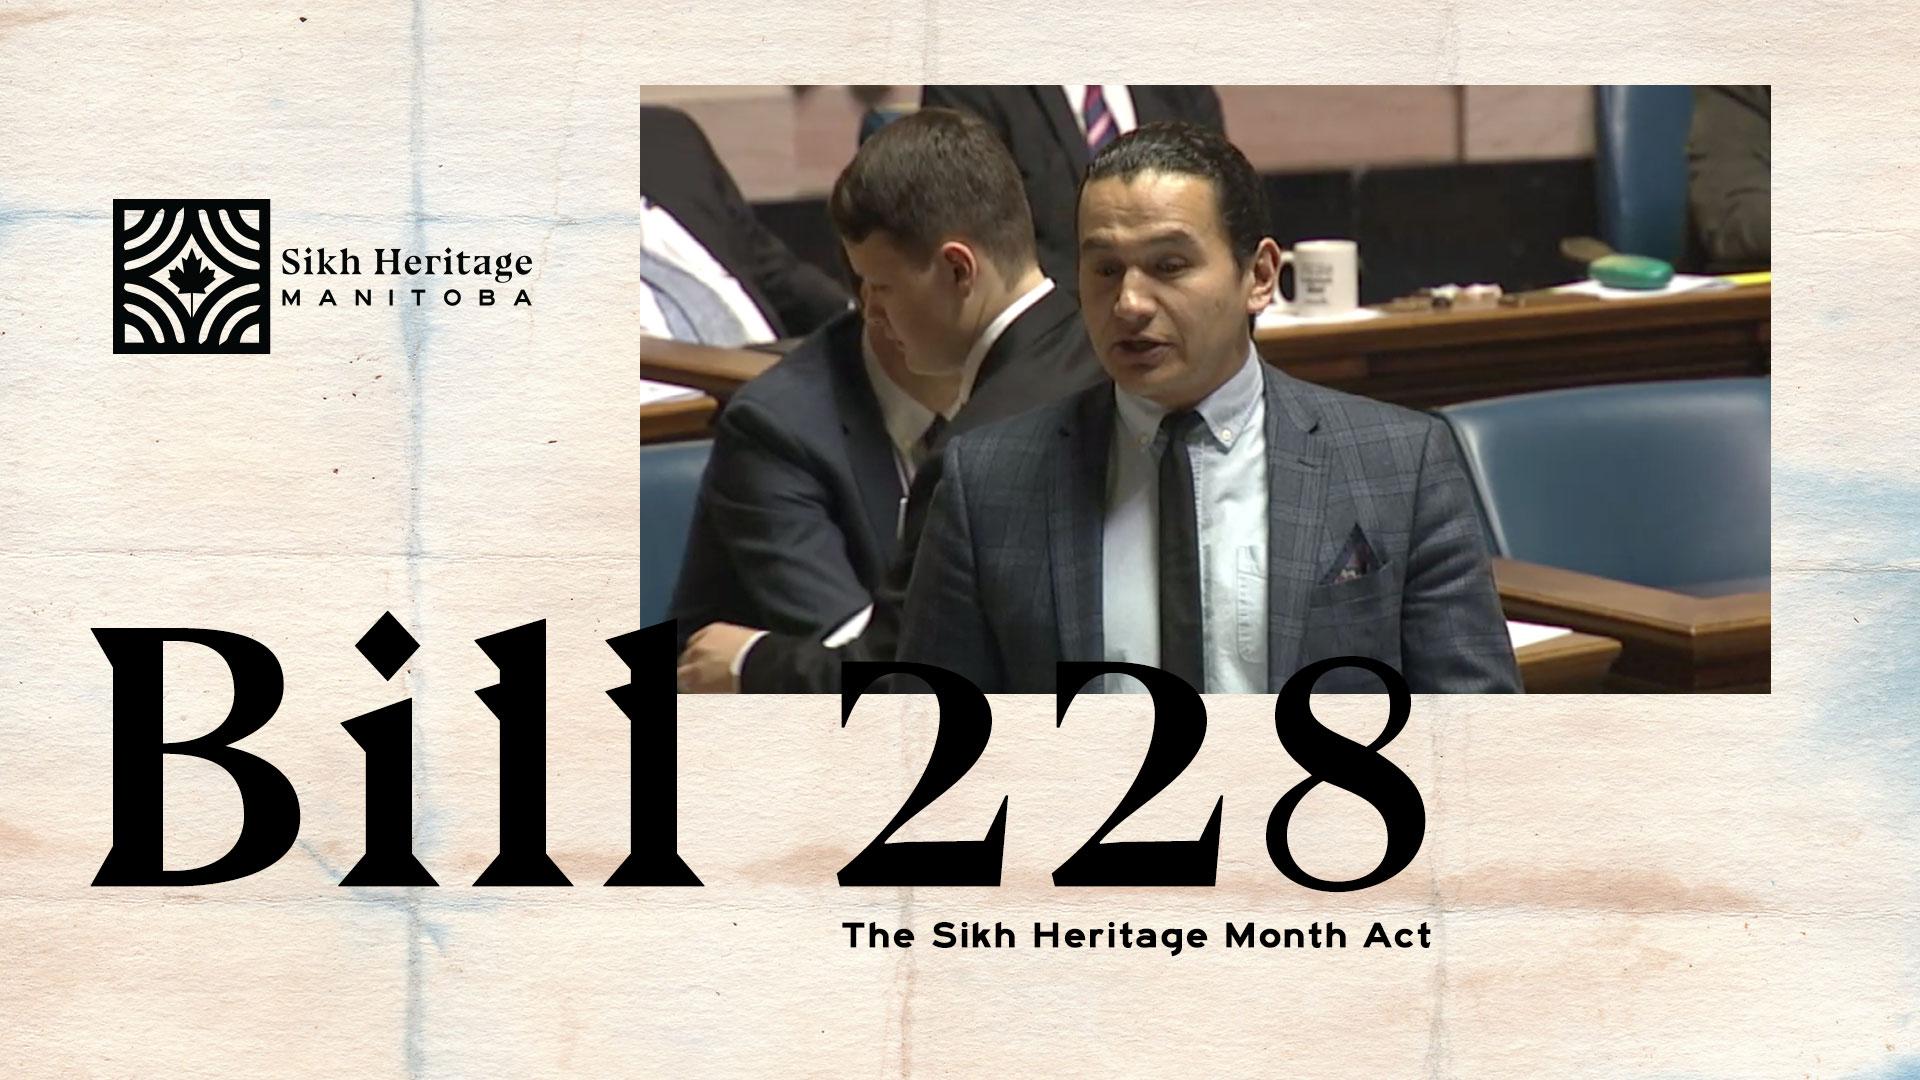 Bill-228-cover.jpg